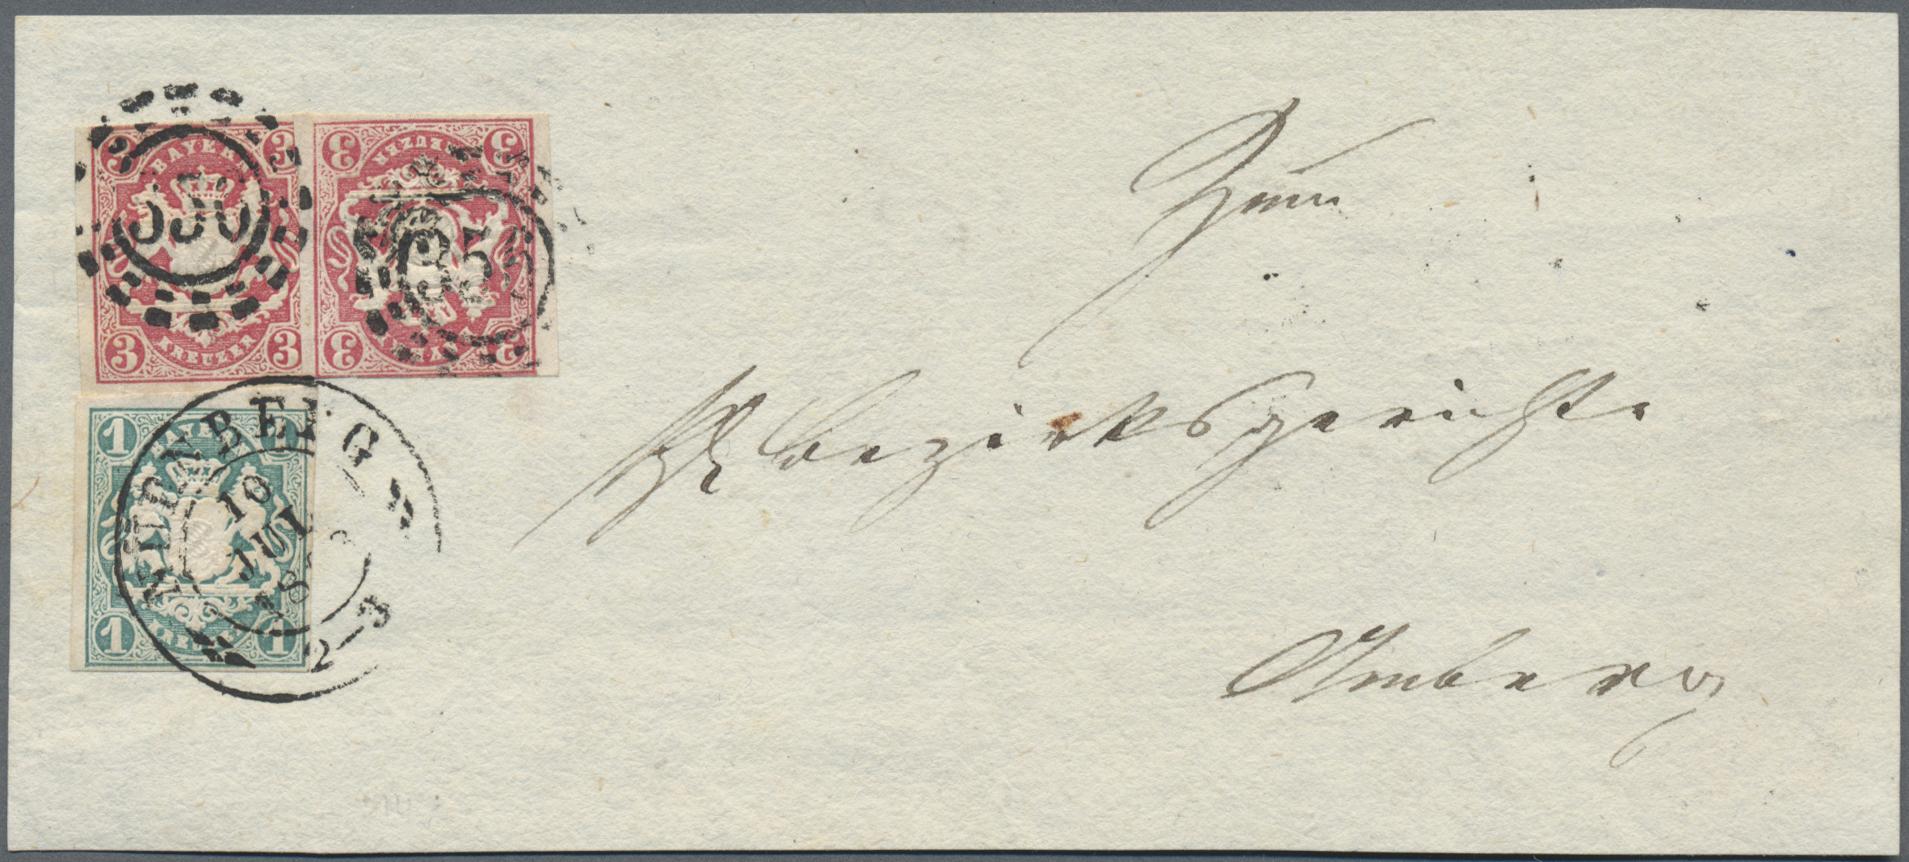 Lot 36174 - Bayern - Marken und Briefe  -  Auktionshaus Christoph Gärtner GmbH & Co. KG Sale #44 Collections Germany